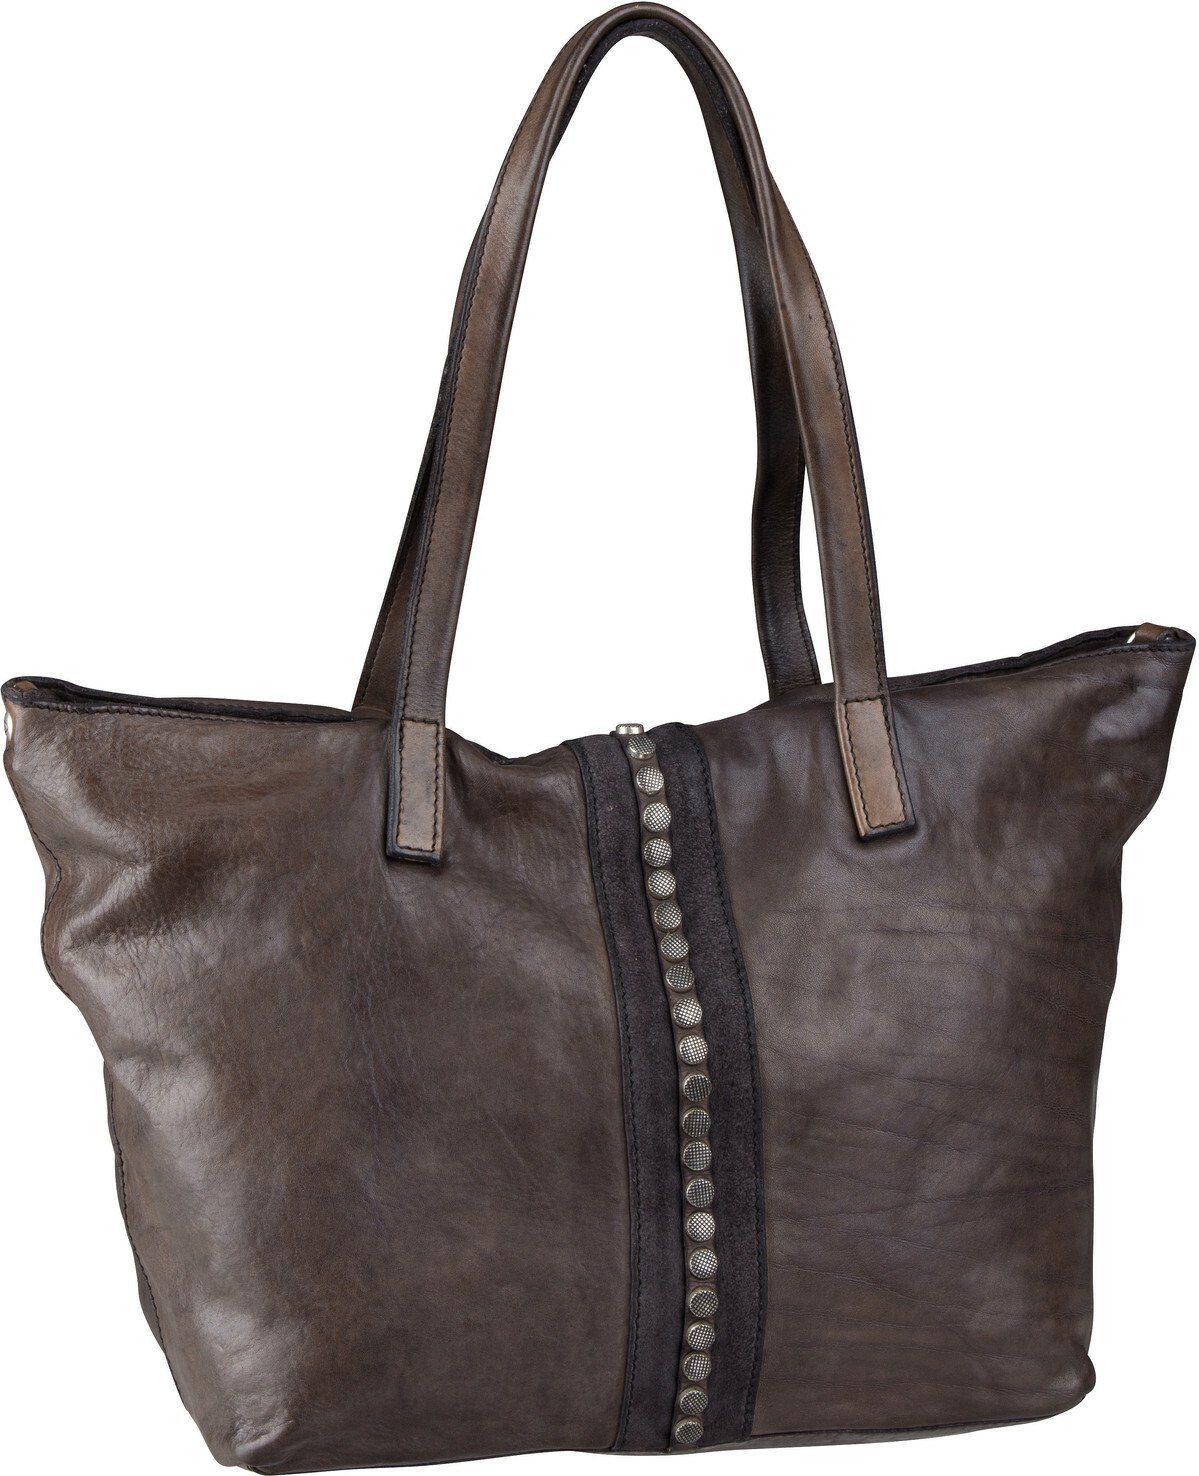 Campomaggi Shopper »Artemide C16830«, Shopper online kaufen | OTTO